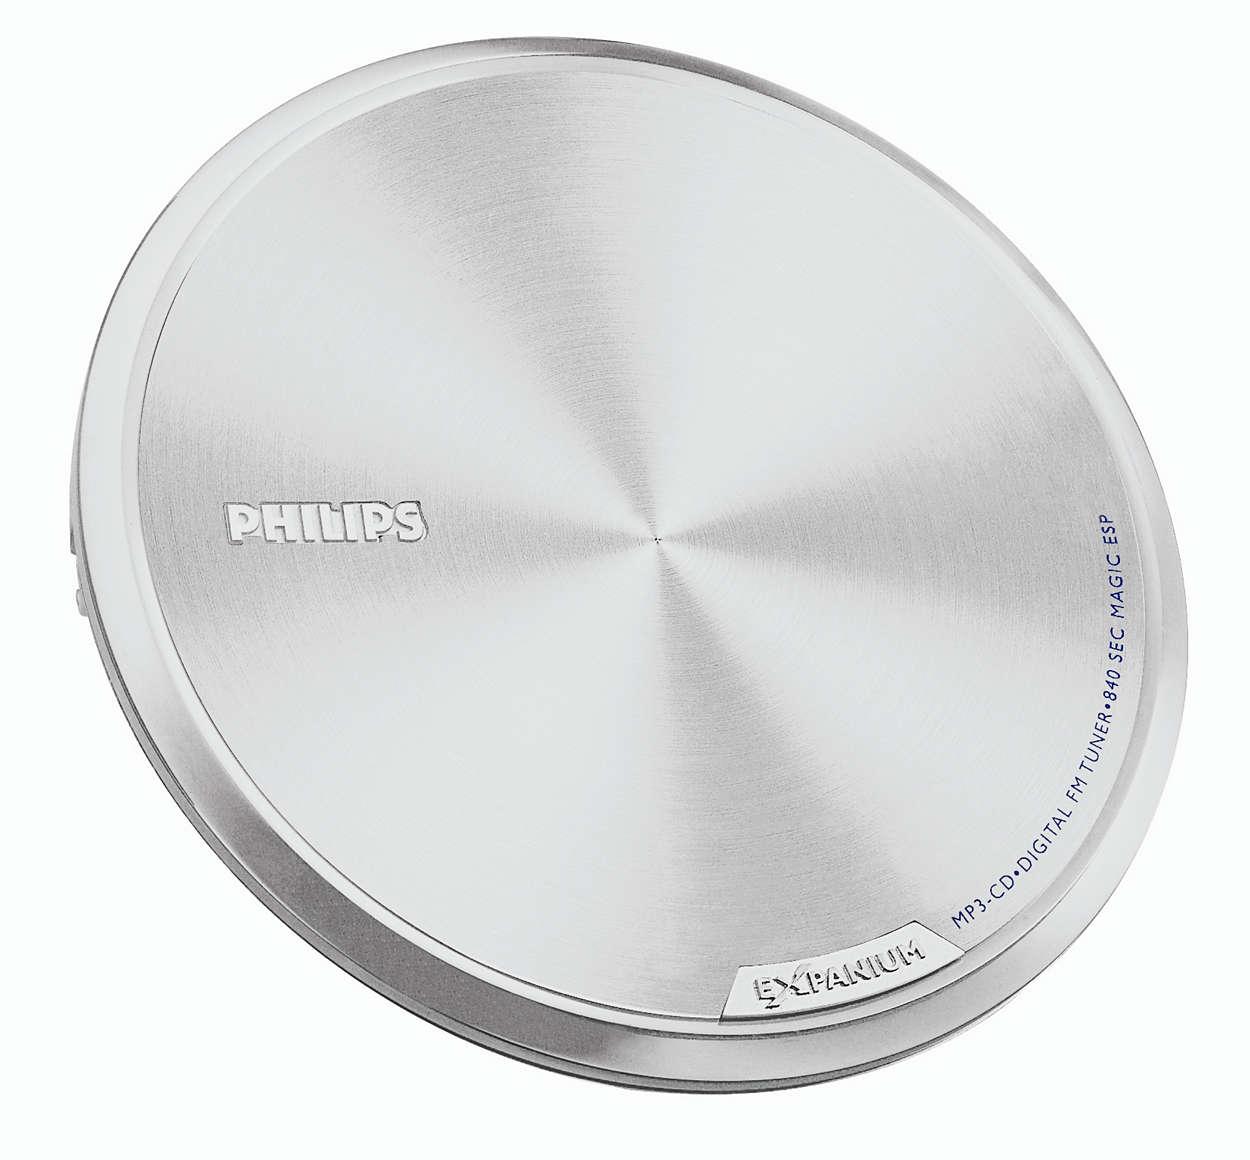 Superpłaski i lekki odtwarzacz MP3-CD